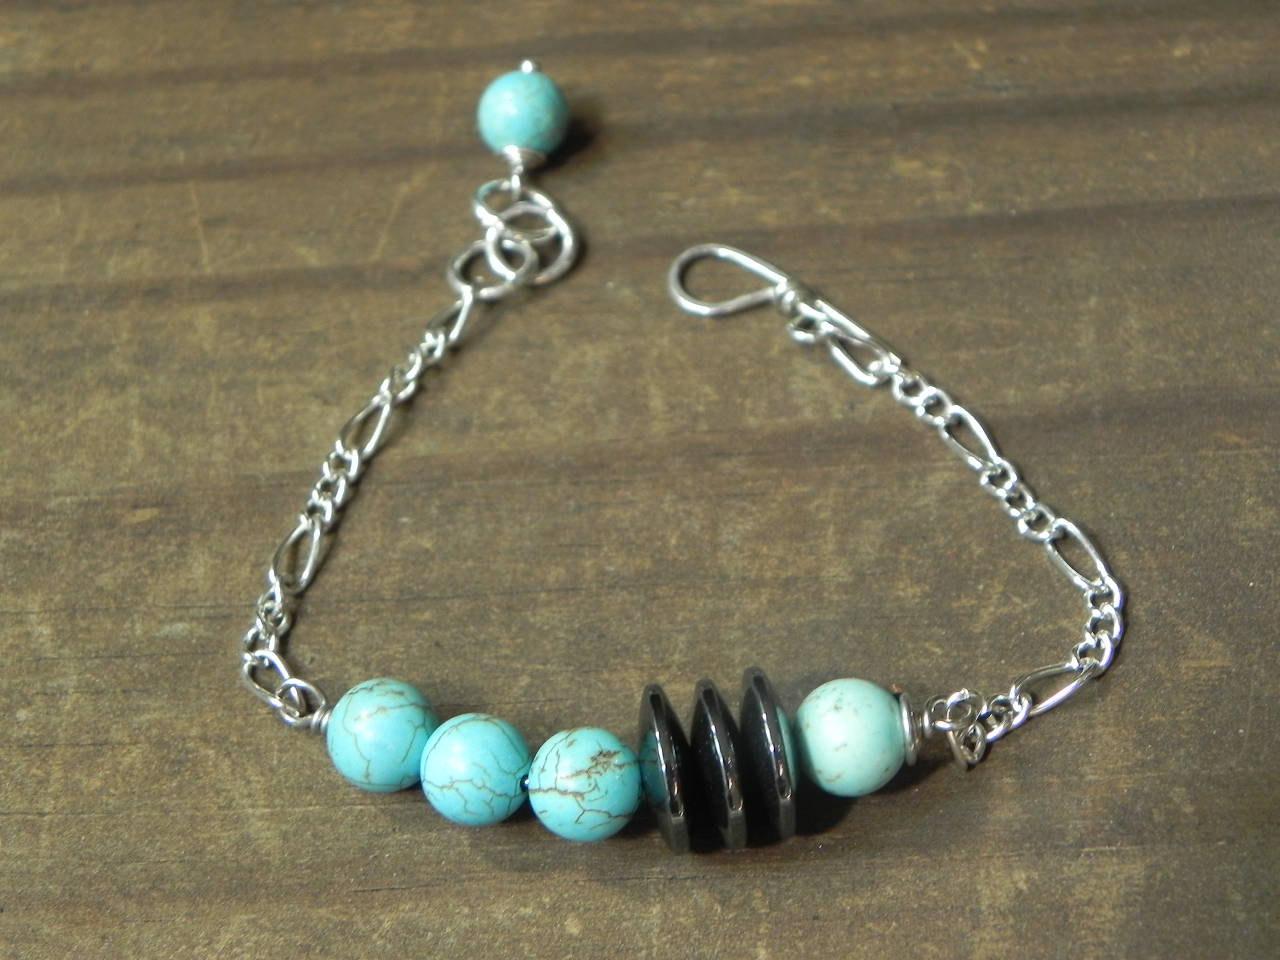 geometric bracelet mod bracelet sleek bracelet by AdrianaSoto